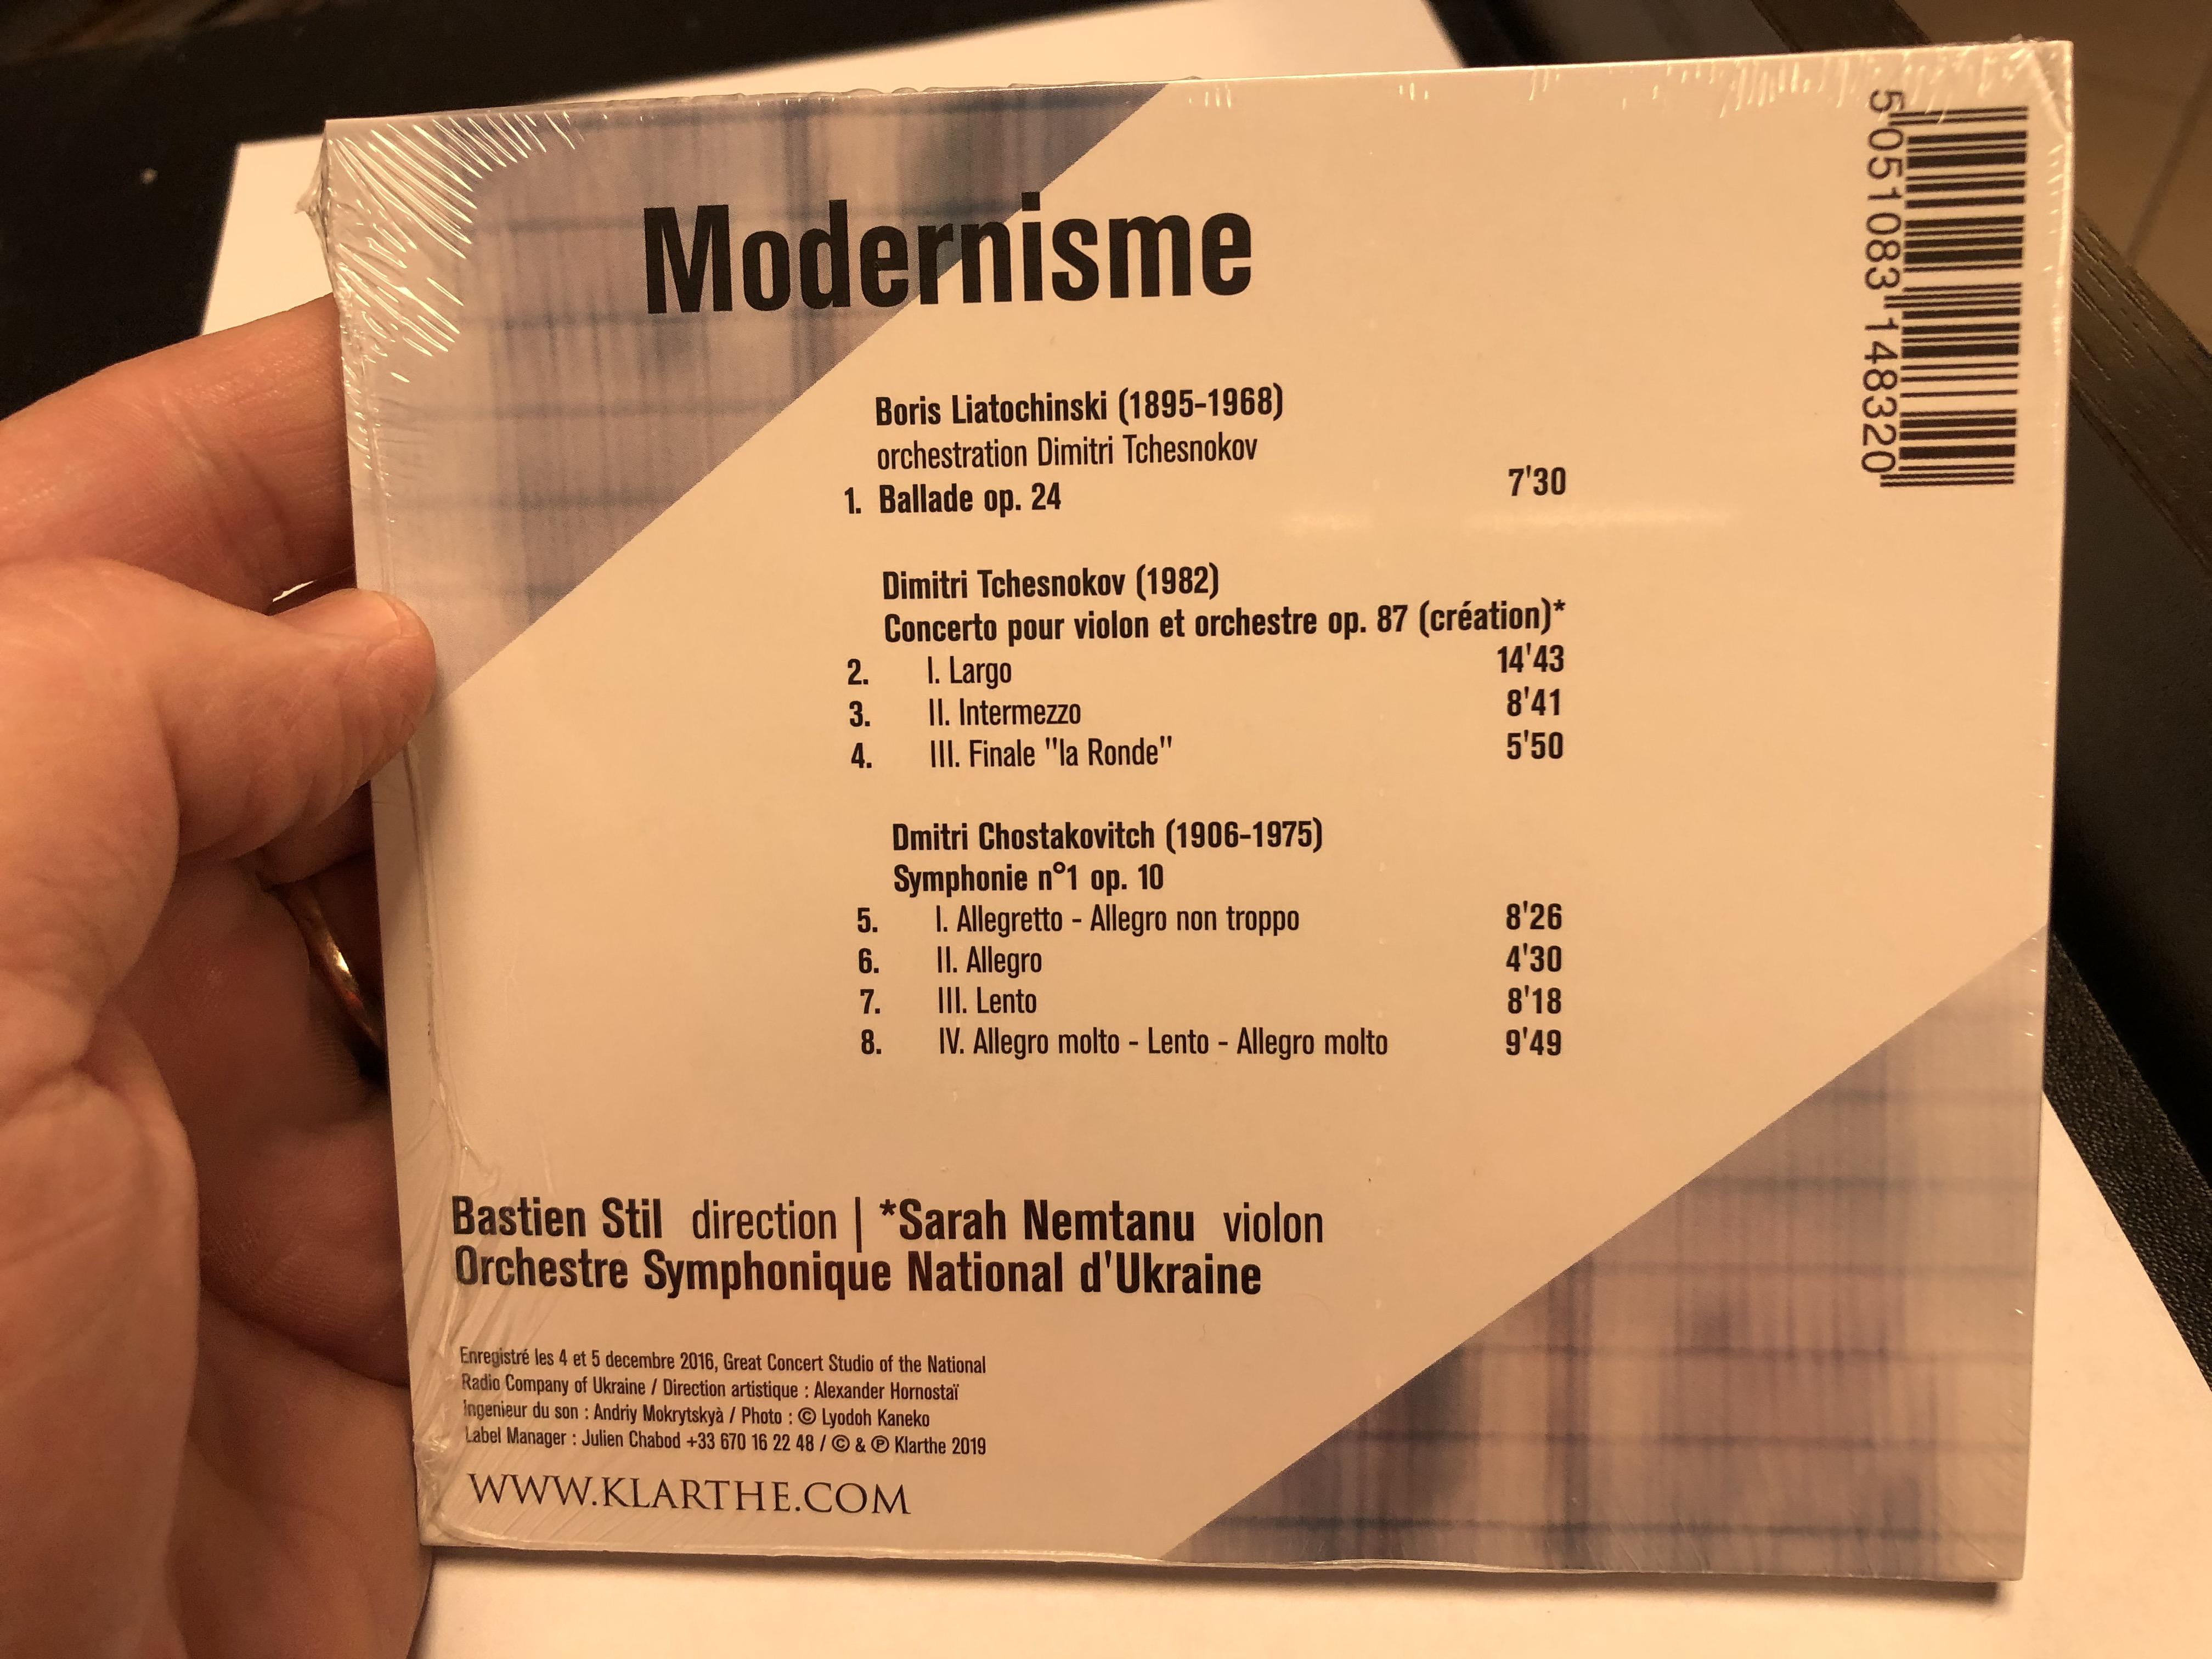 modernisme-chostakovitch-symphonie-no1-tchesnokov-concerto-pour-violon-liatochinski-ballade-bastien-stil-direction-sarah-nemtanu-violon-orchestre-symphonique-national-d-ukrai.jpg